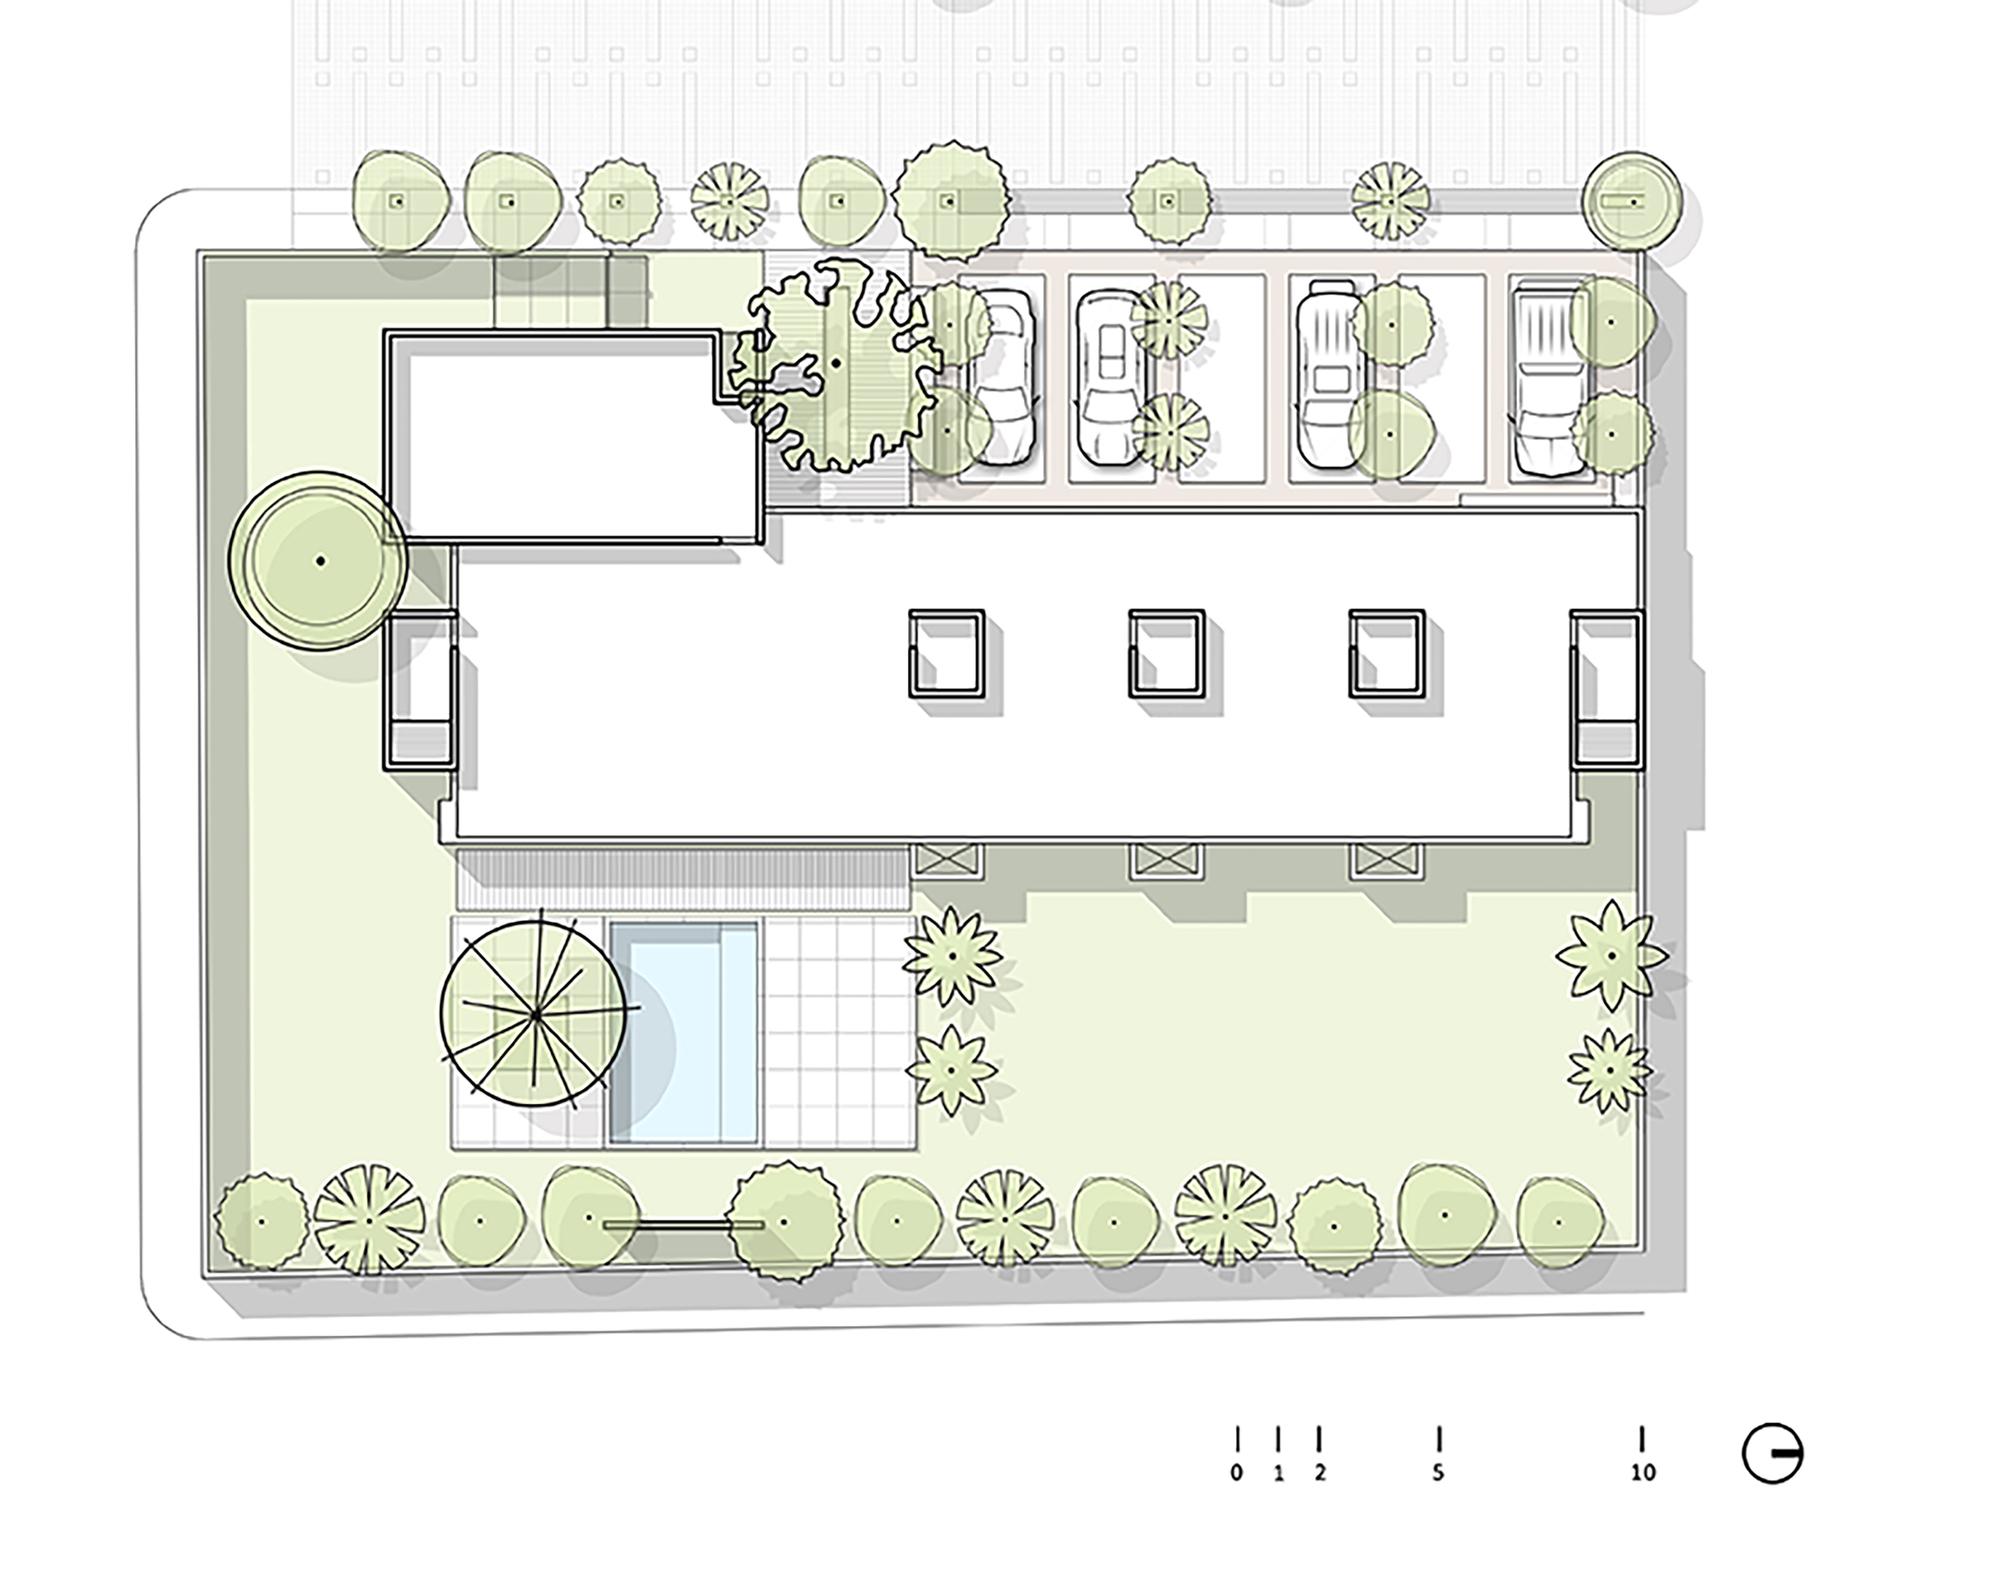 Galeria de resid ncia de mauito e pato mauricio gallegos for Plantas de colegios arquitectura